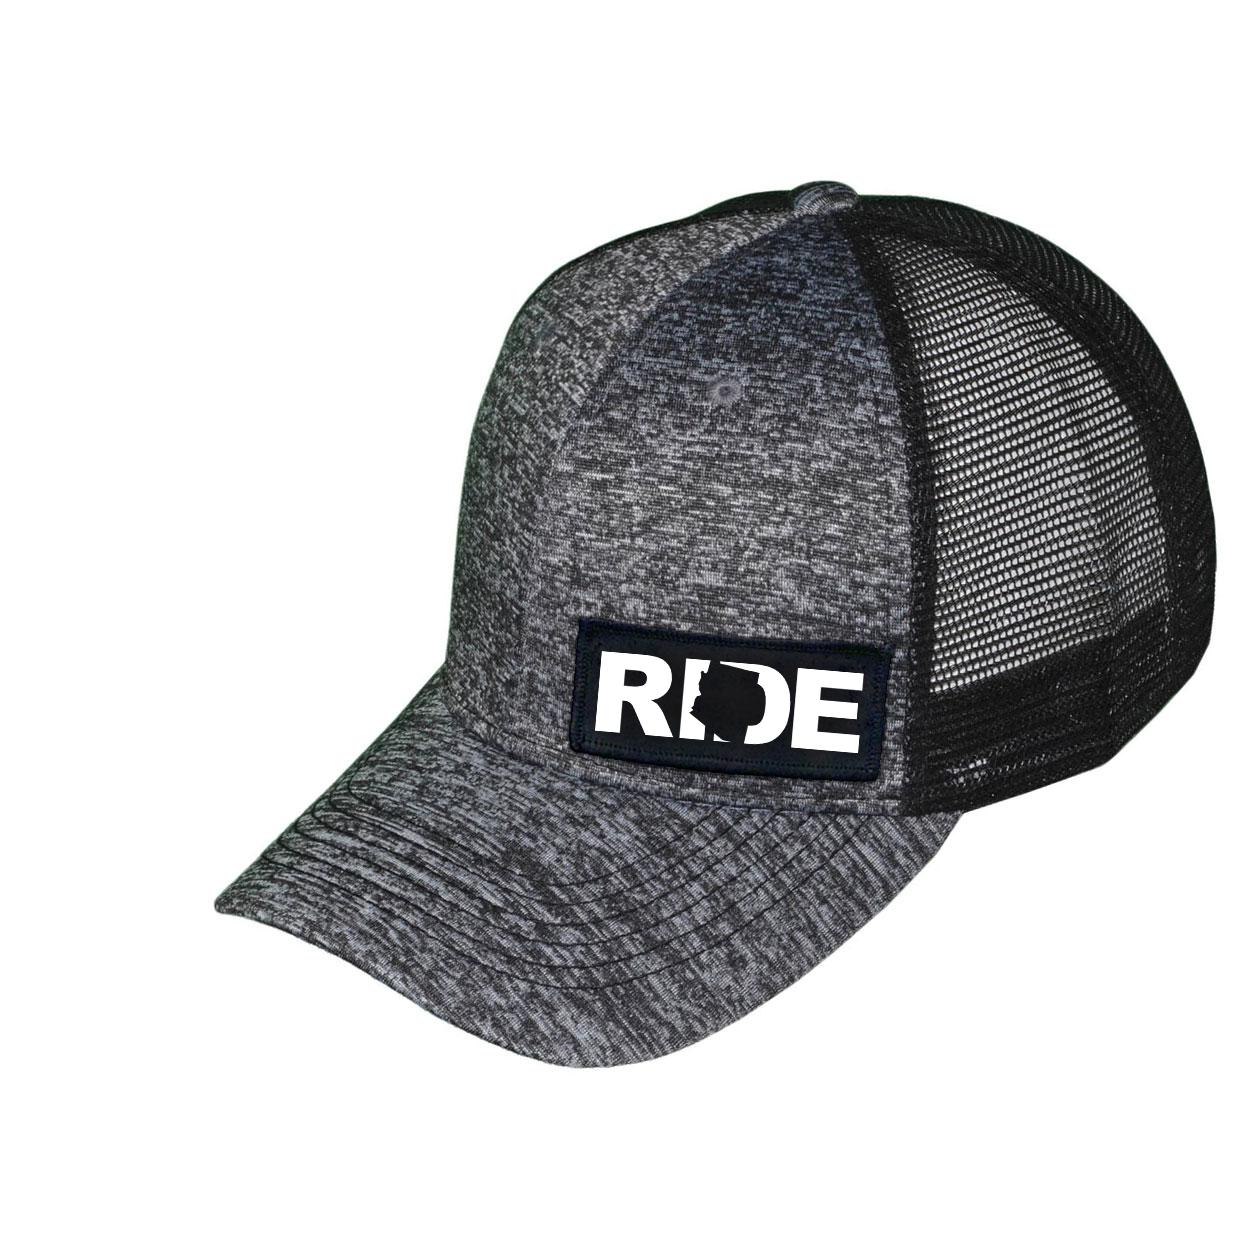 Ride Arizona Night Out Woven Patch Melange Snapback Trucker Hat Gray/Black (White Logo)